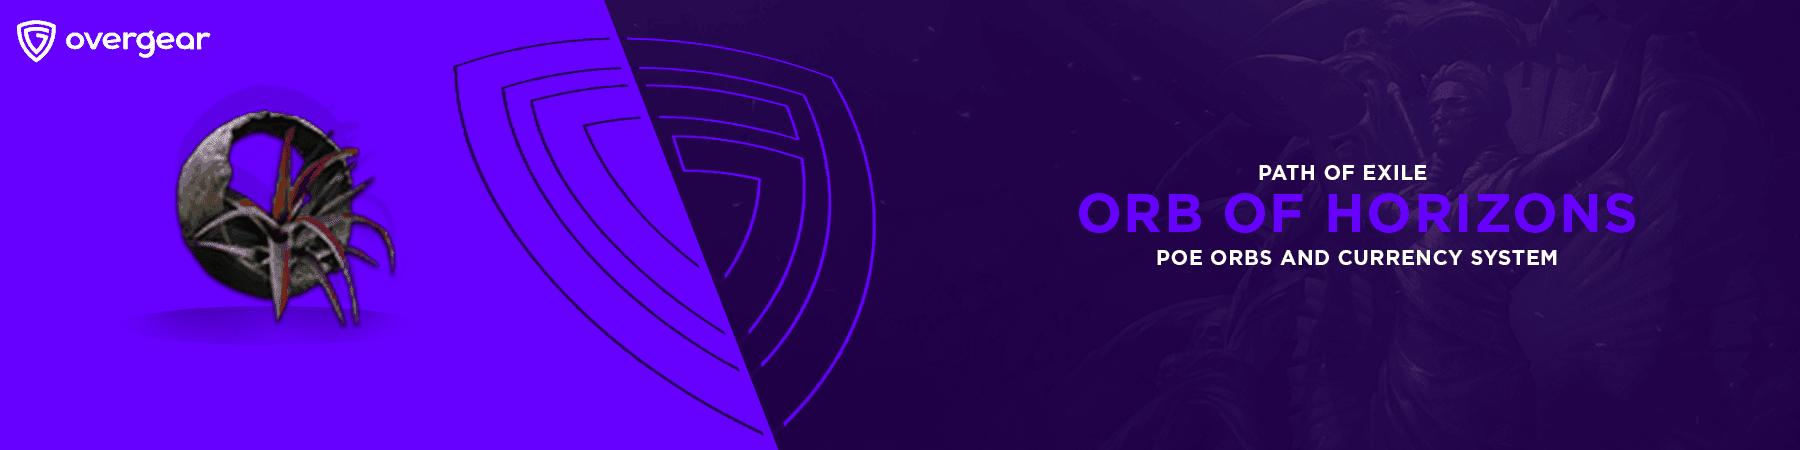 Orb of Horizons PoE